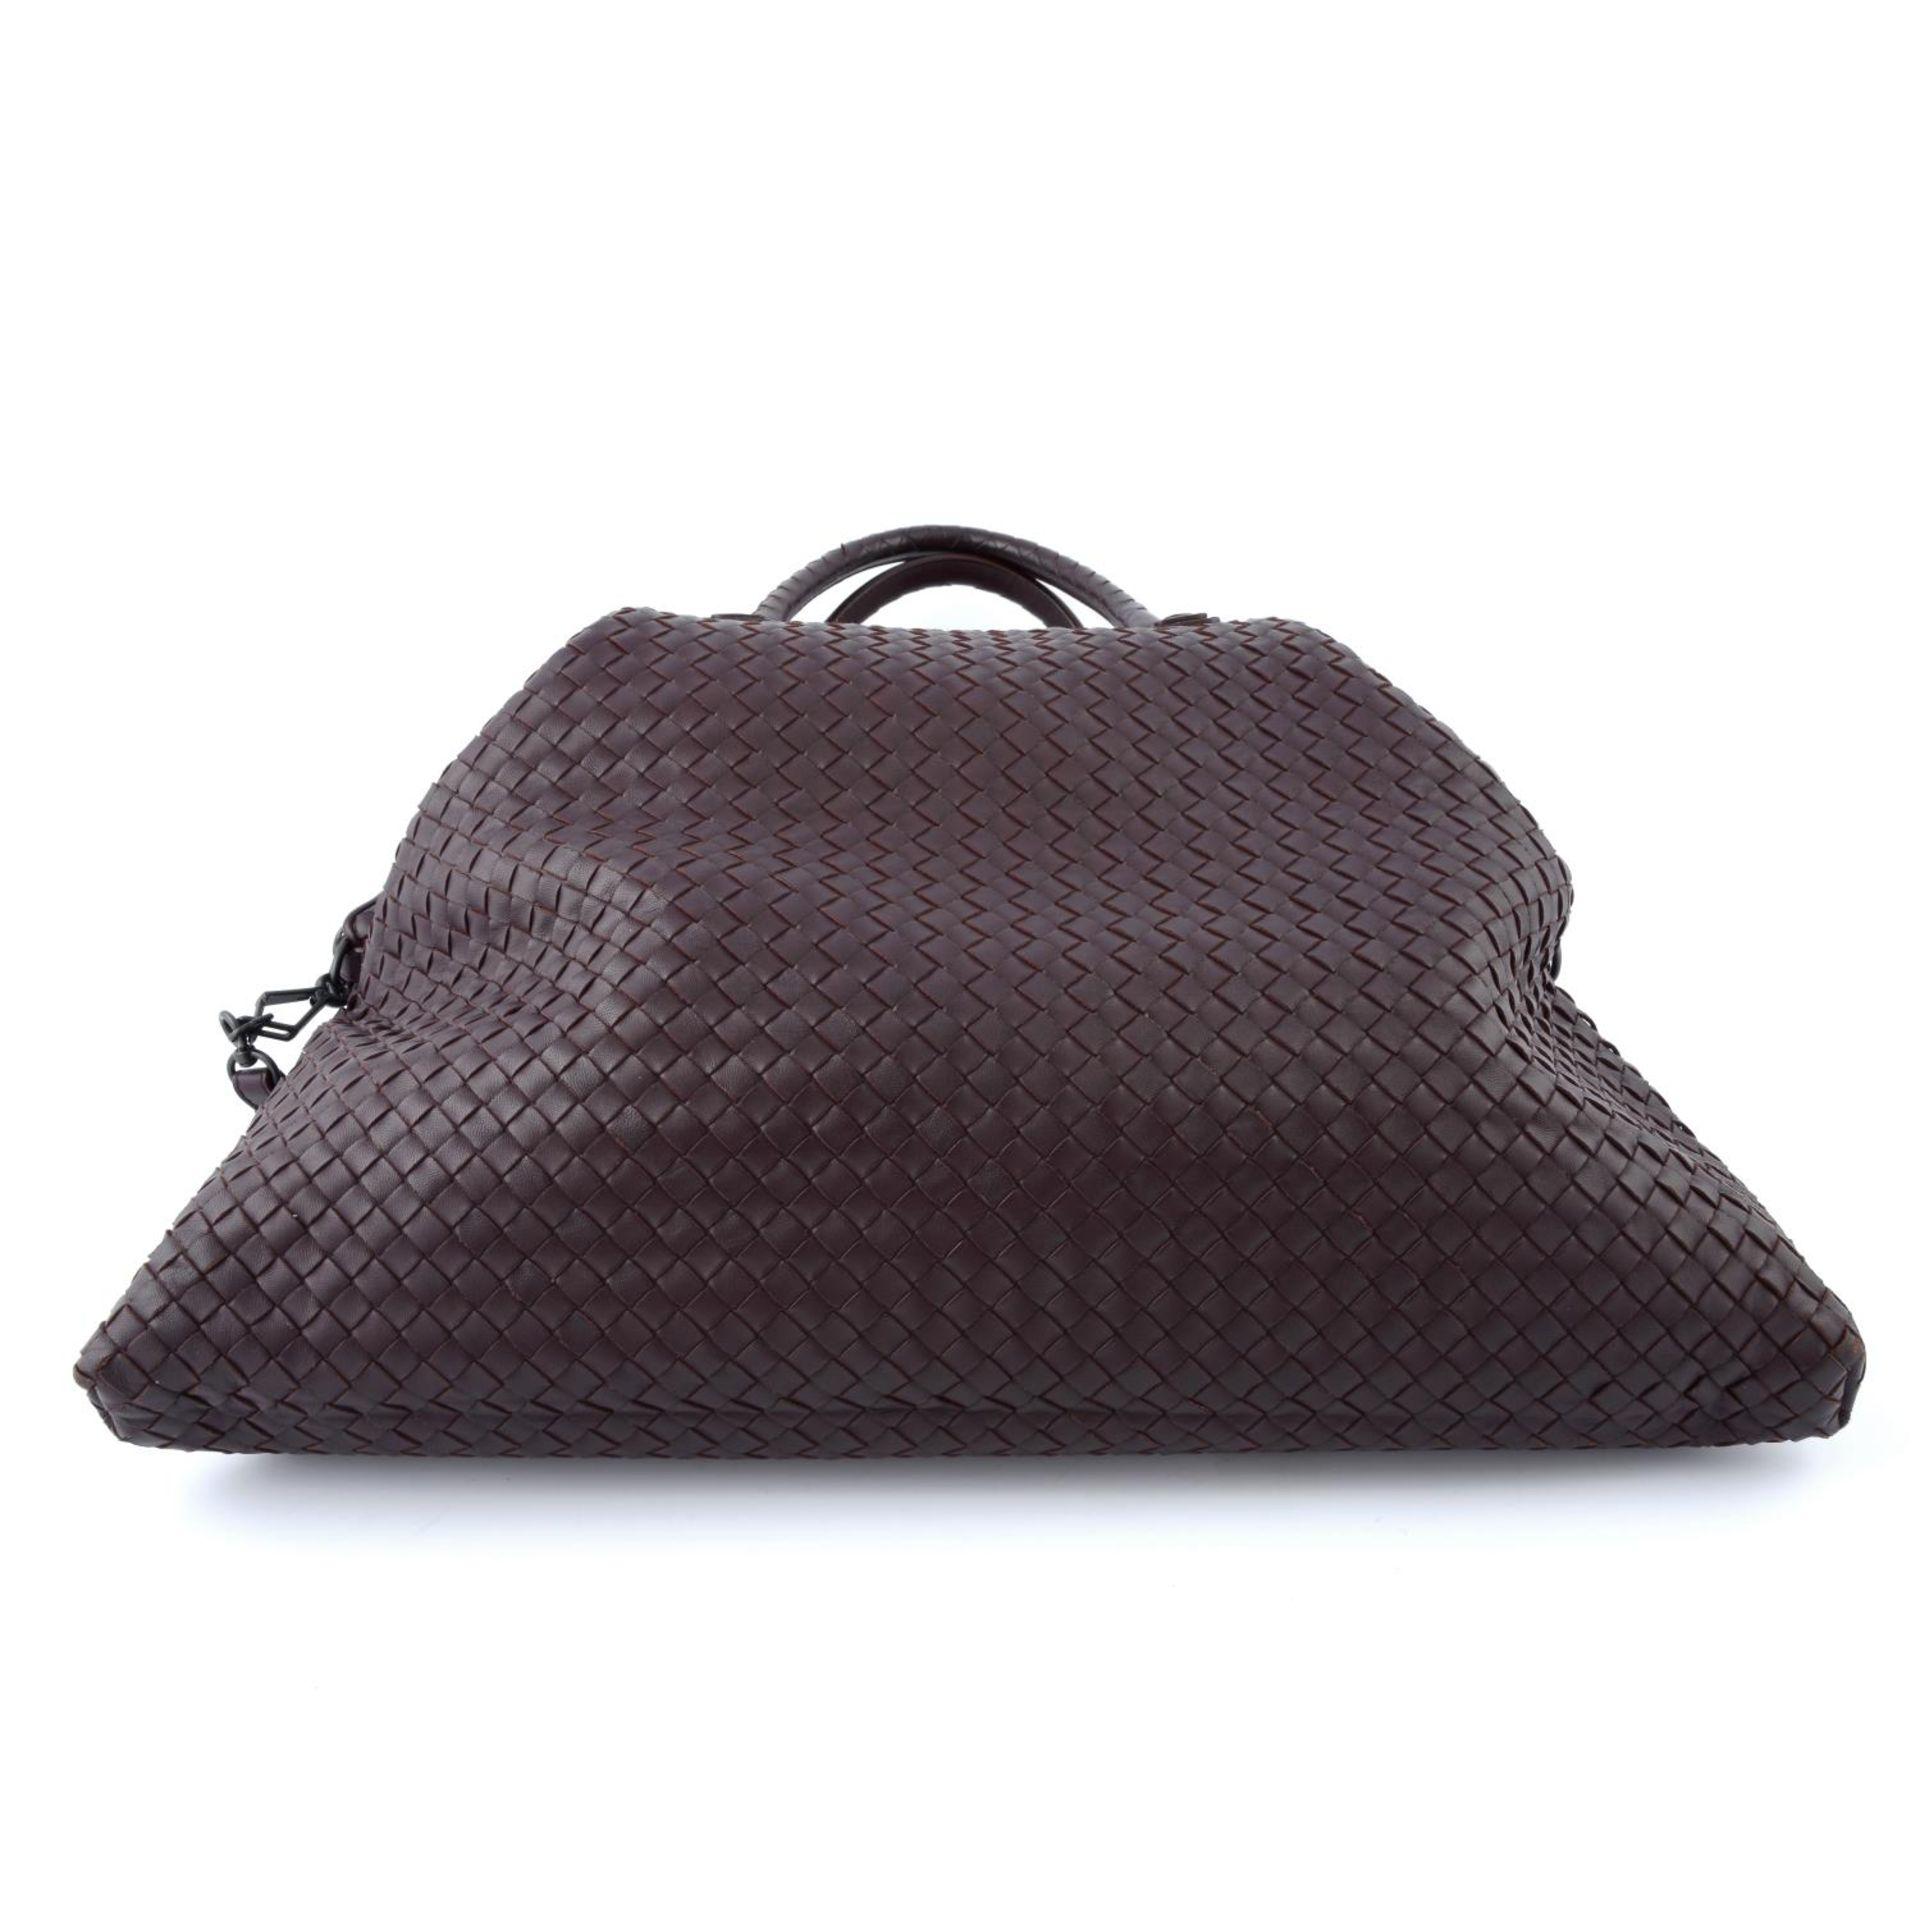 BOTTEGA VENETA - an XL fold over Nappa Intrecciato handbag. - Image 5 of 5